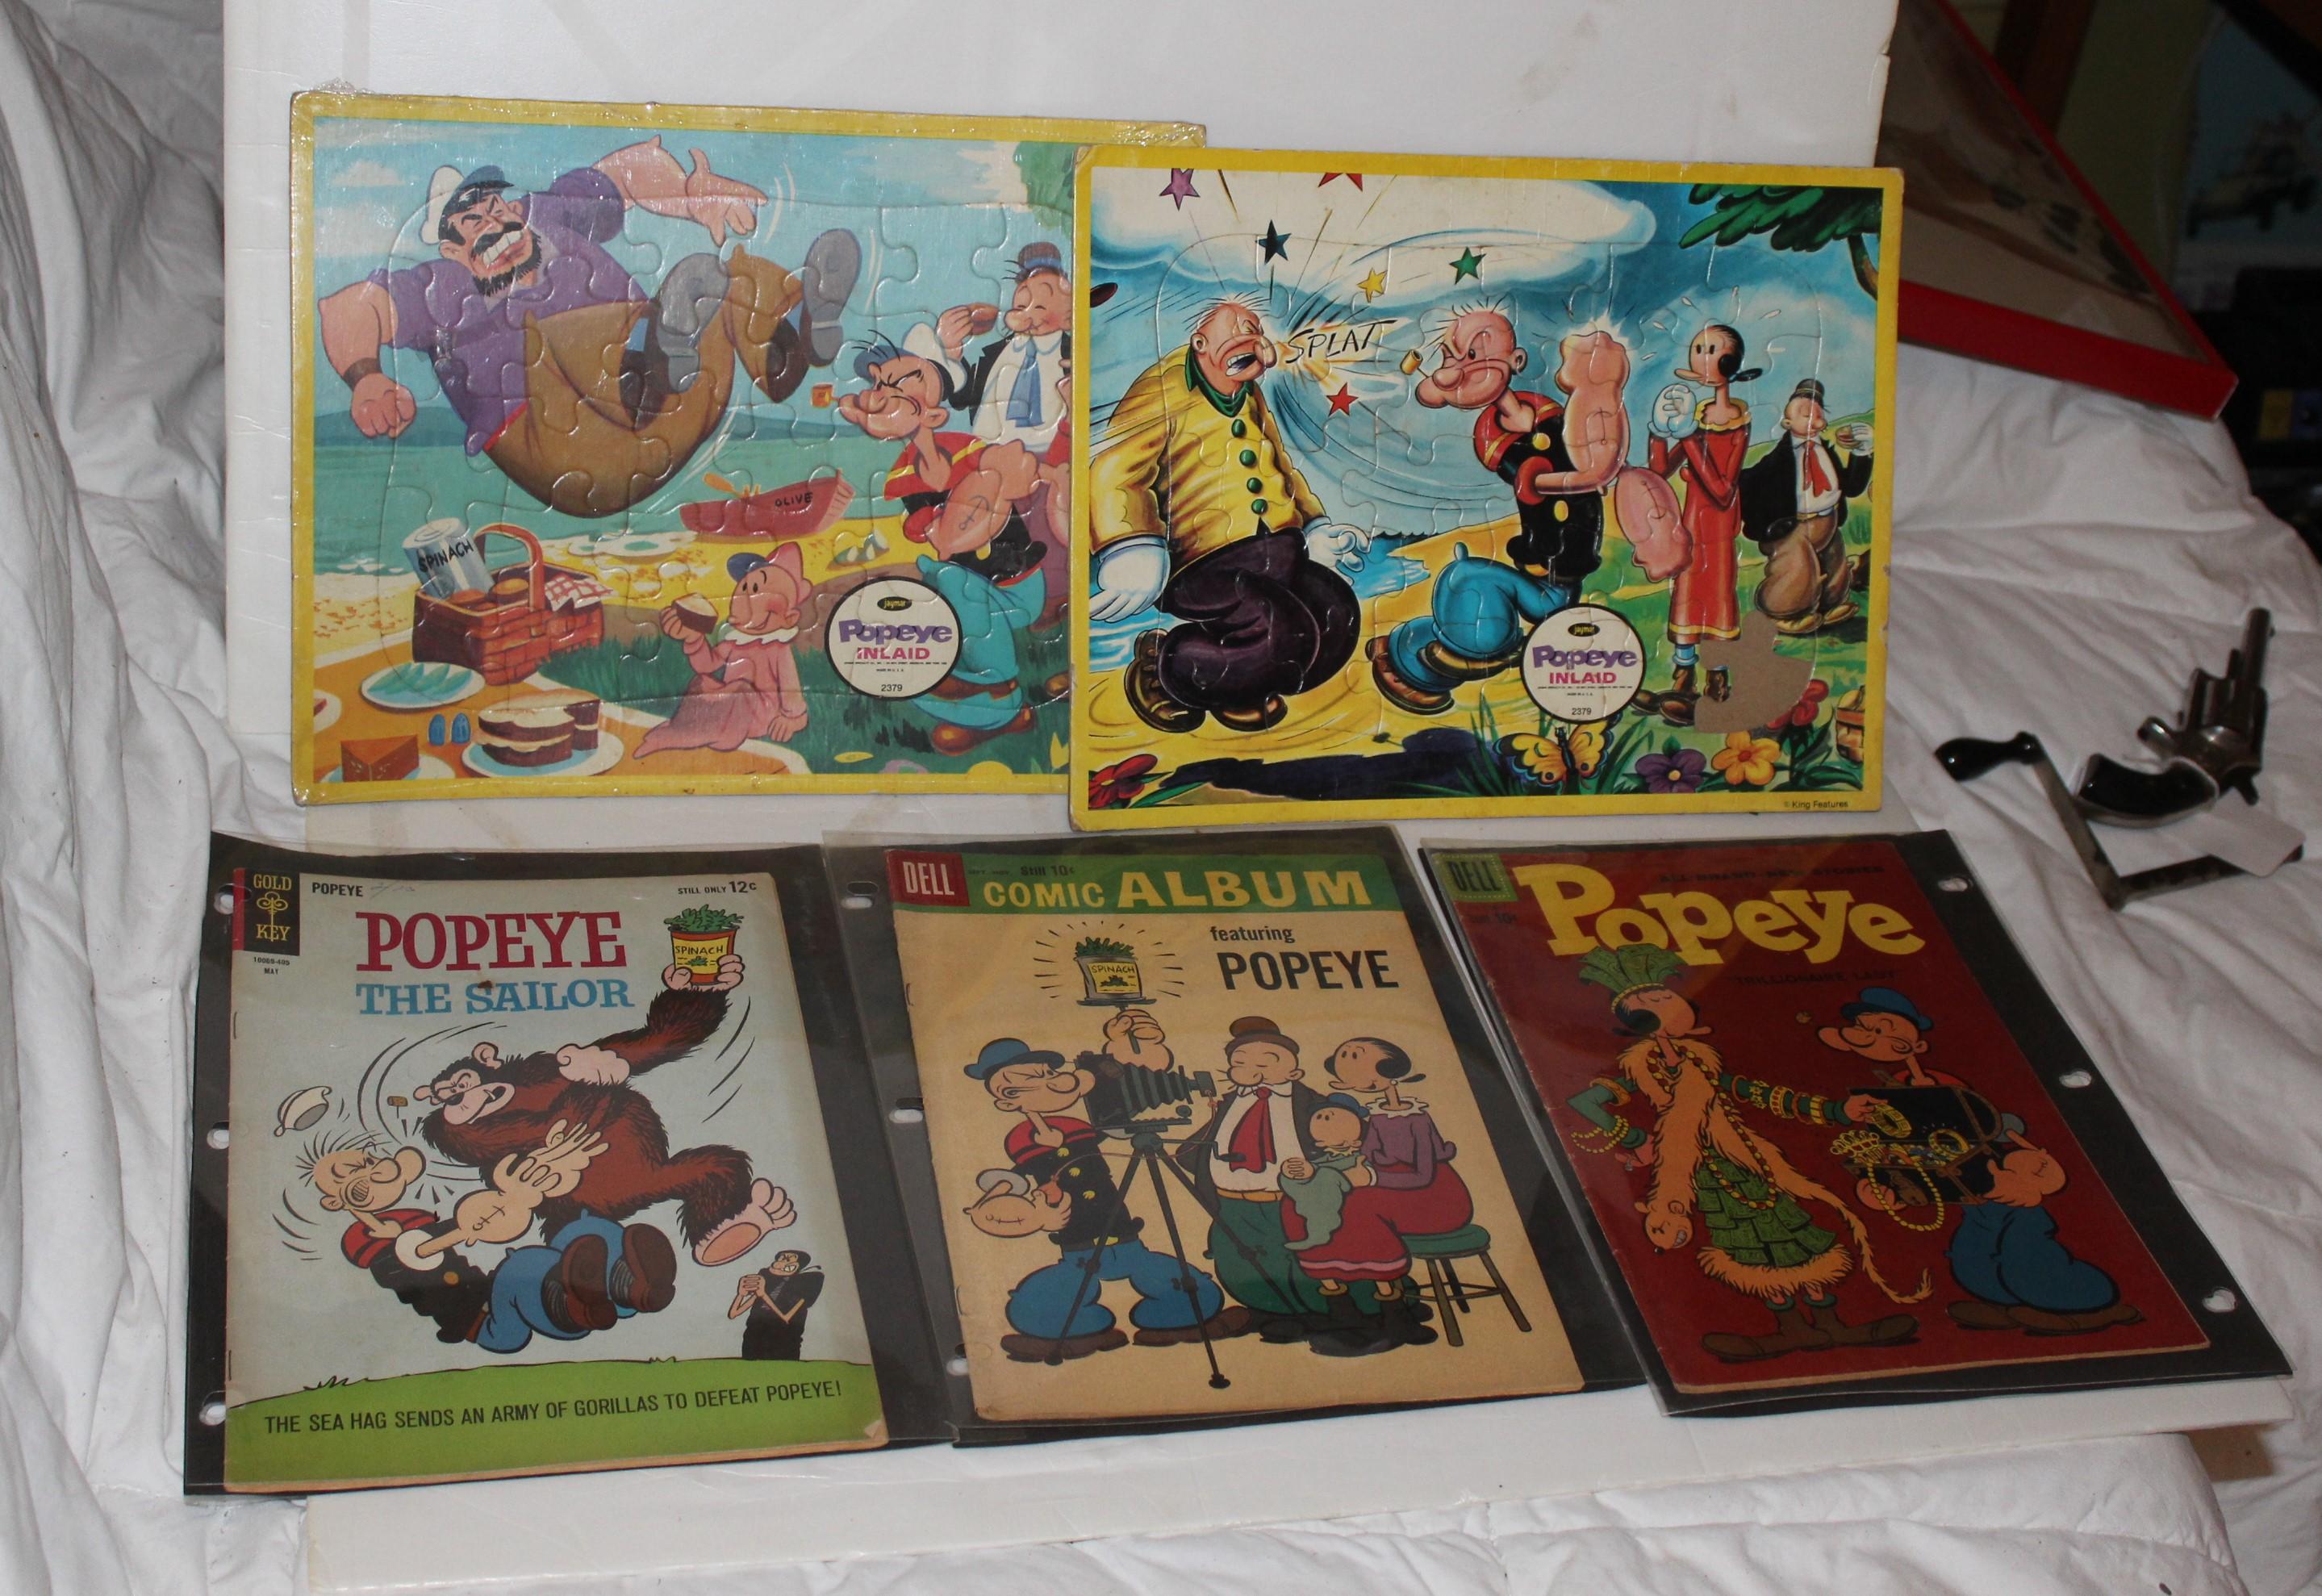 https://0201.nccdn.net/1_2/000/000/147/641/Popeye-literature.JPG